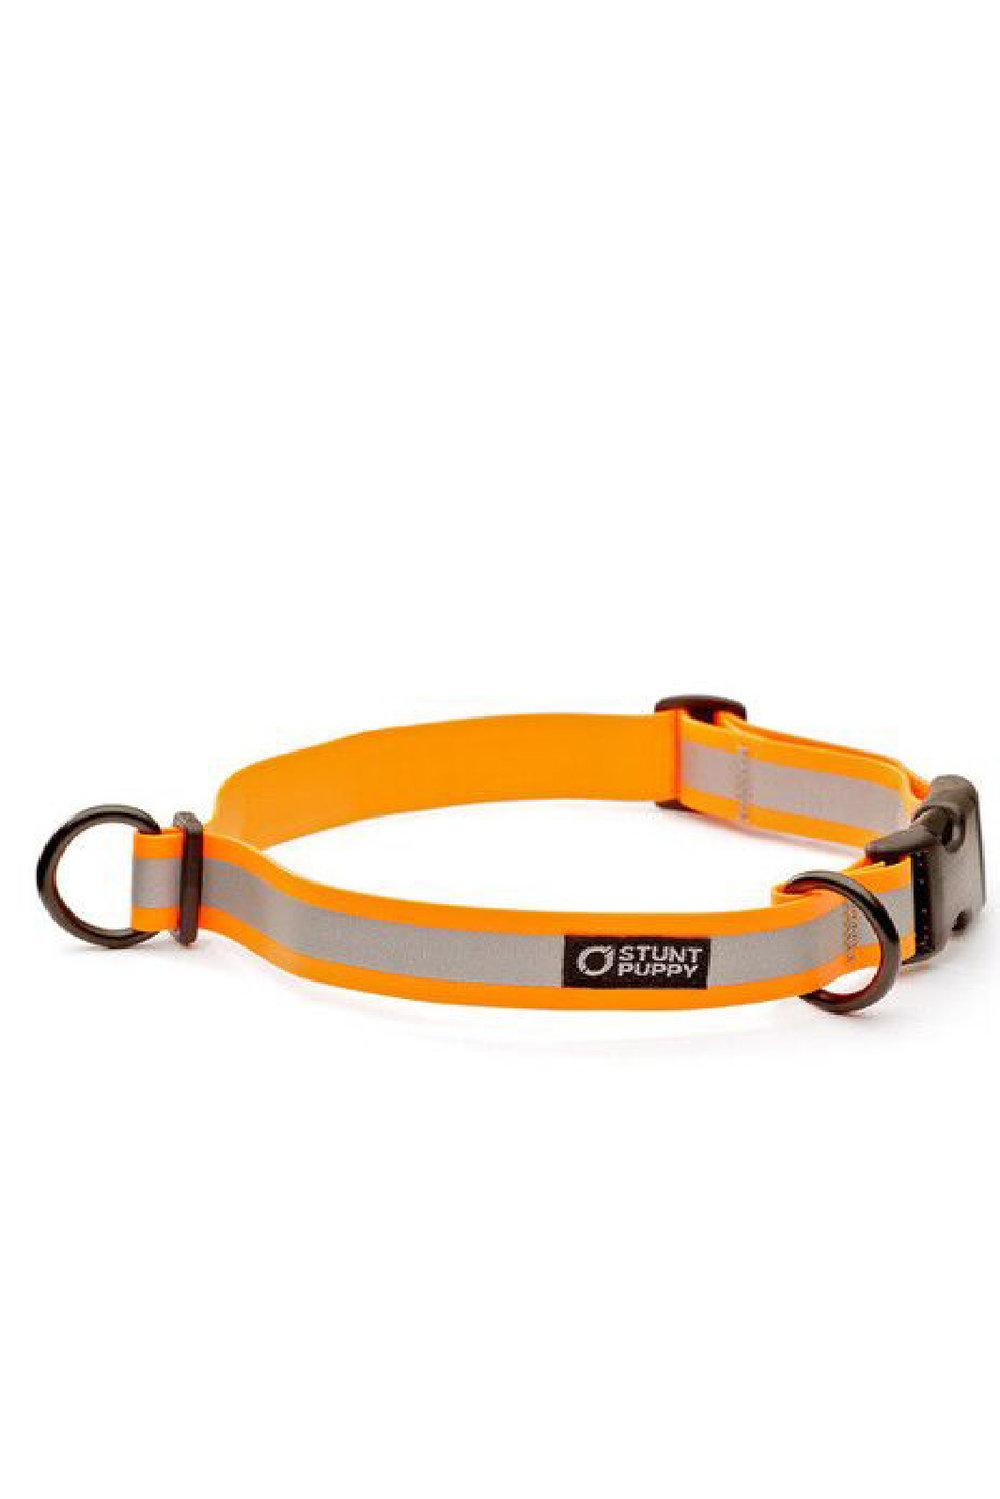 shop online - dog collar